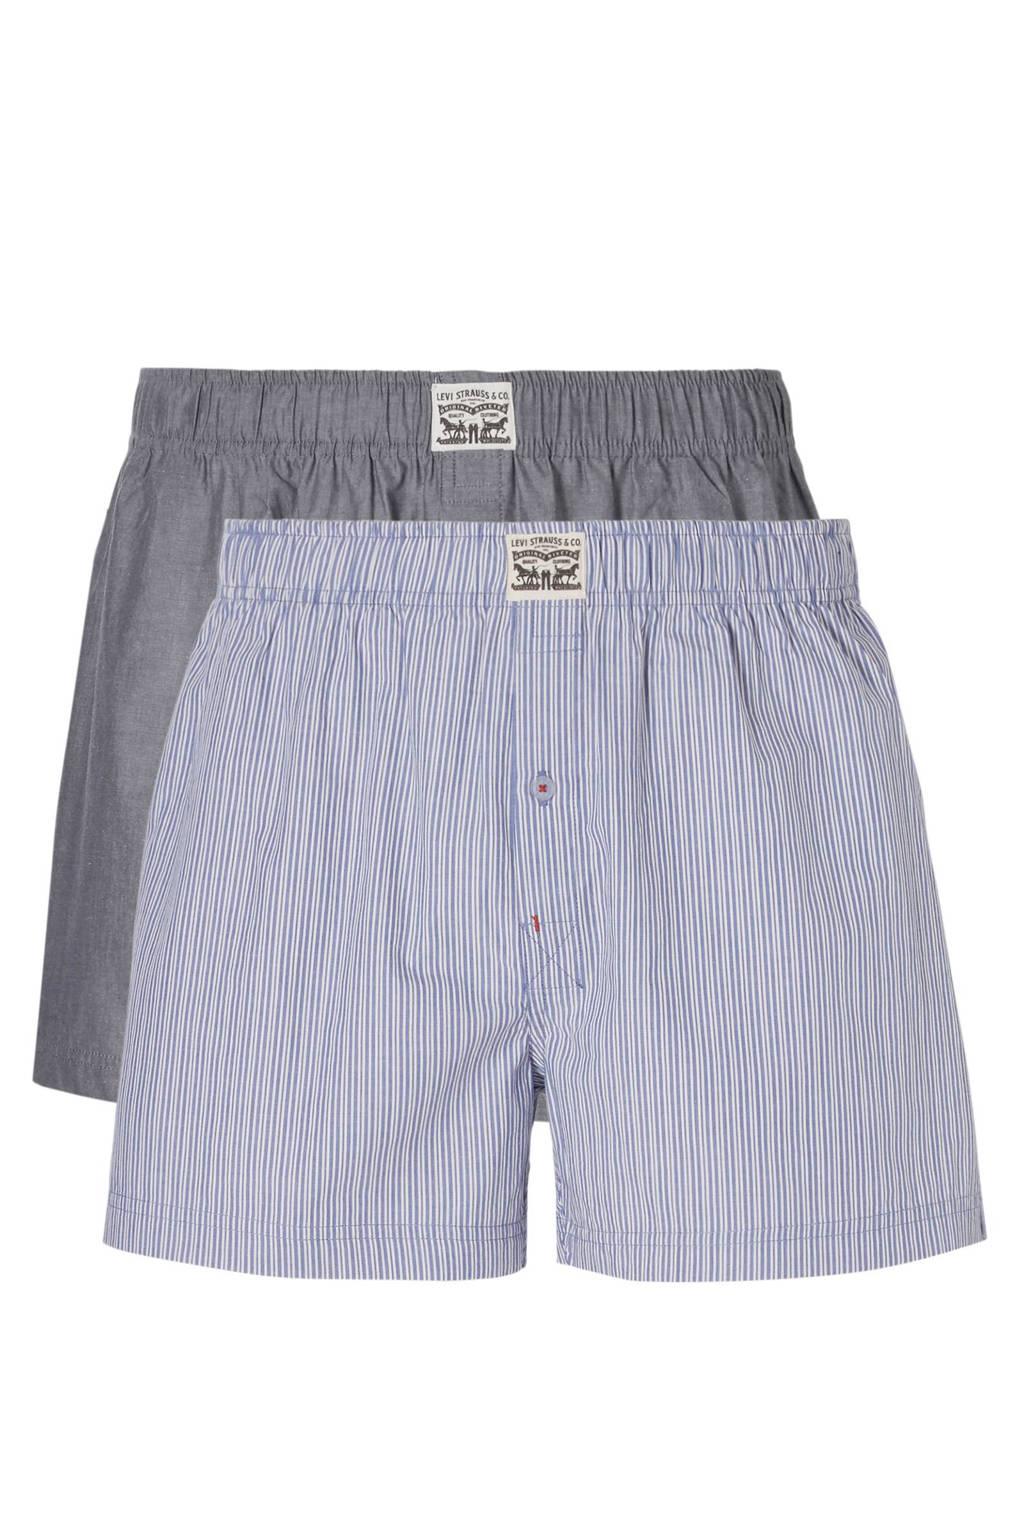 Levi's boxershort - set van 2, Lichtblauw/wit/denimblauw